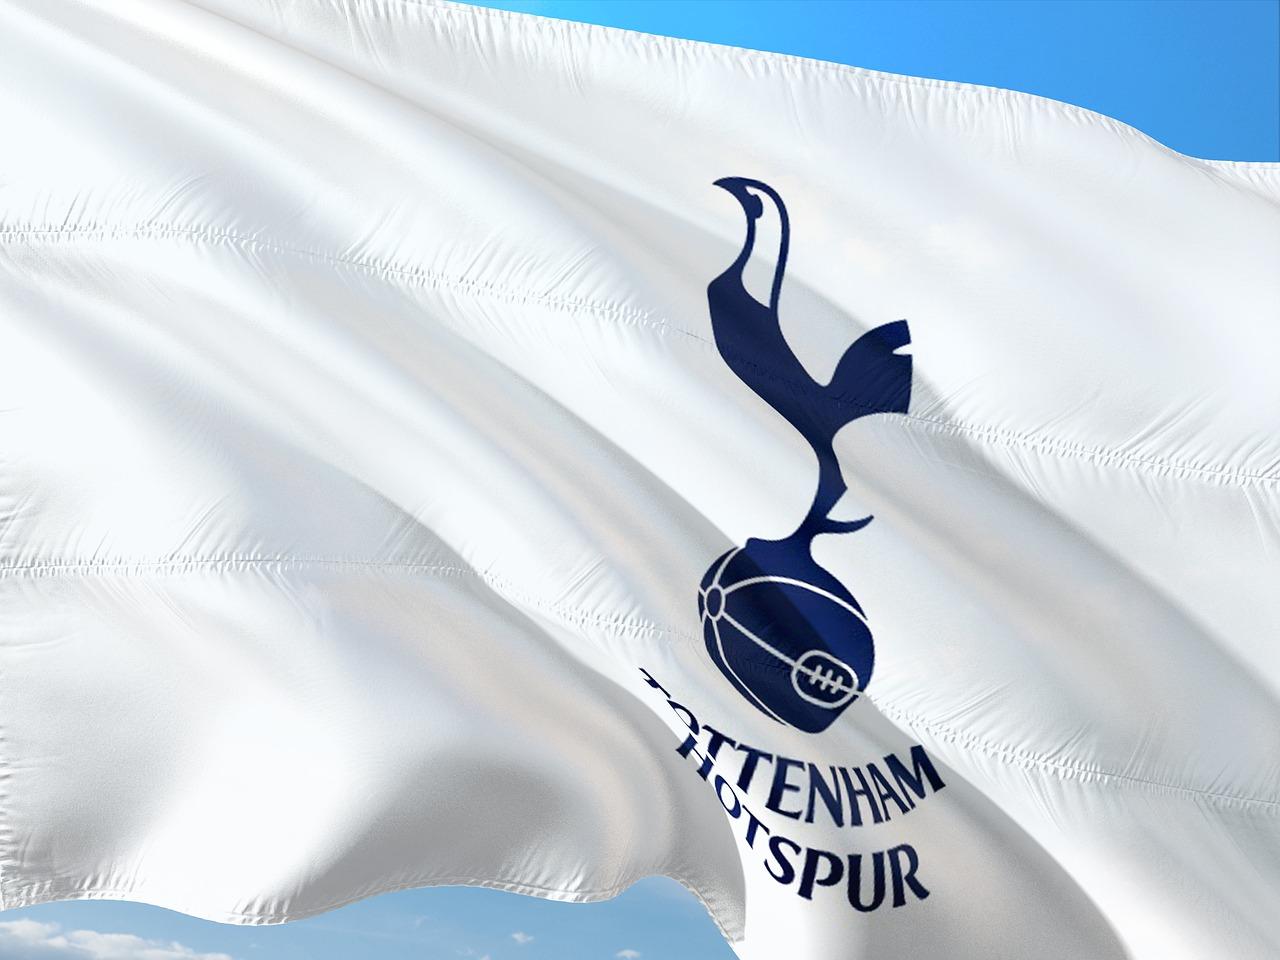 Tottenham Hotspur - Flag